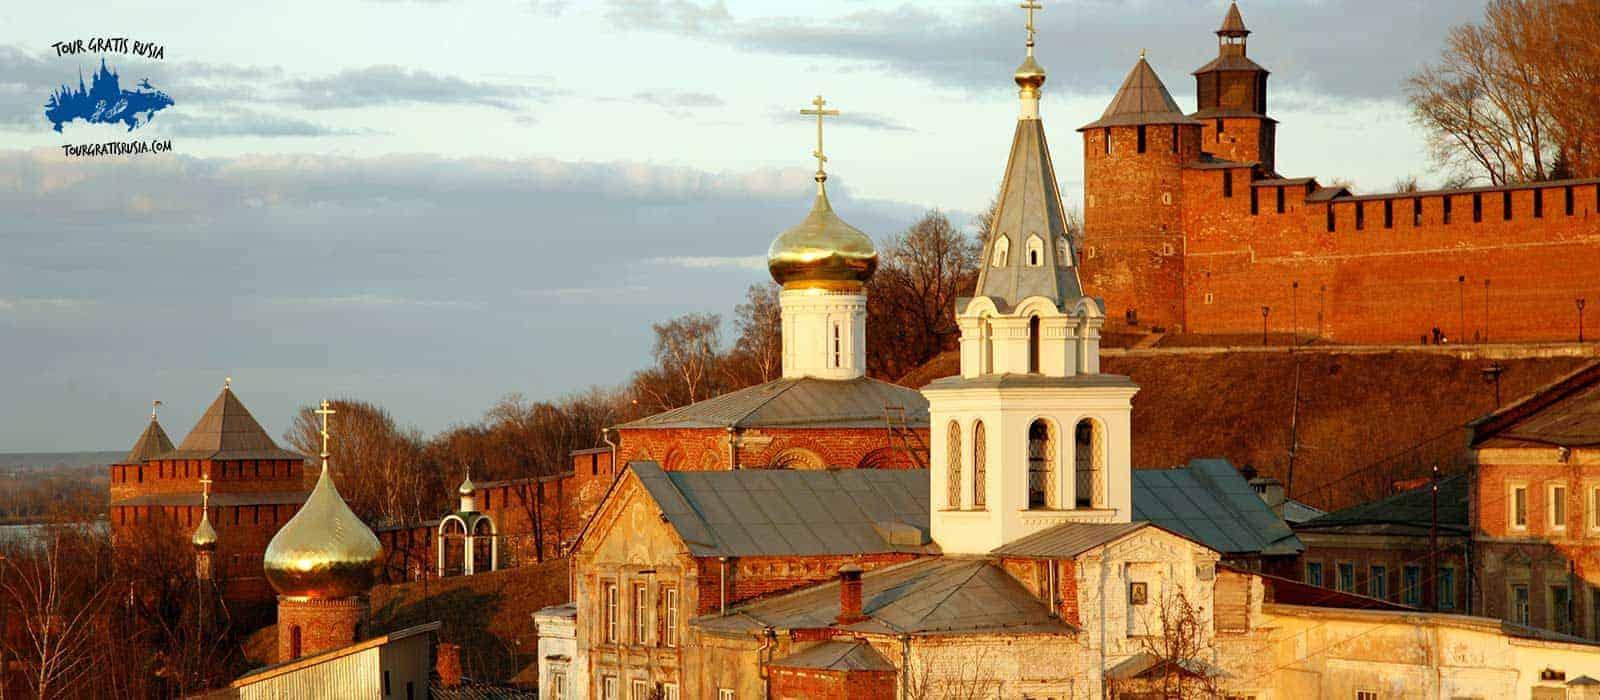 Tour centro histórico de Nizhni Novgorod